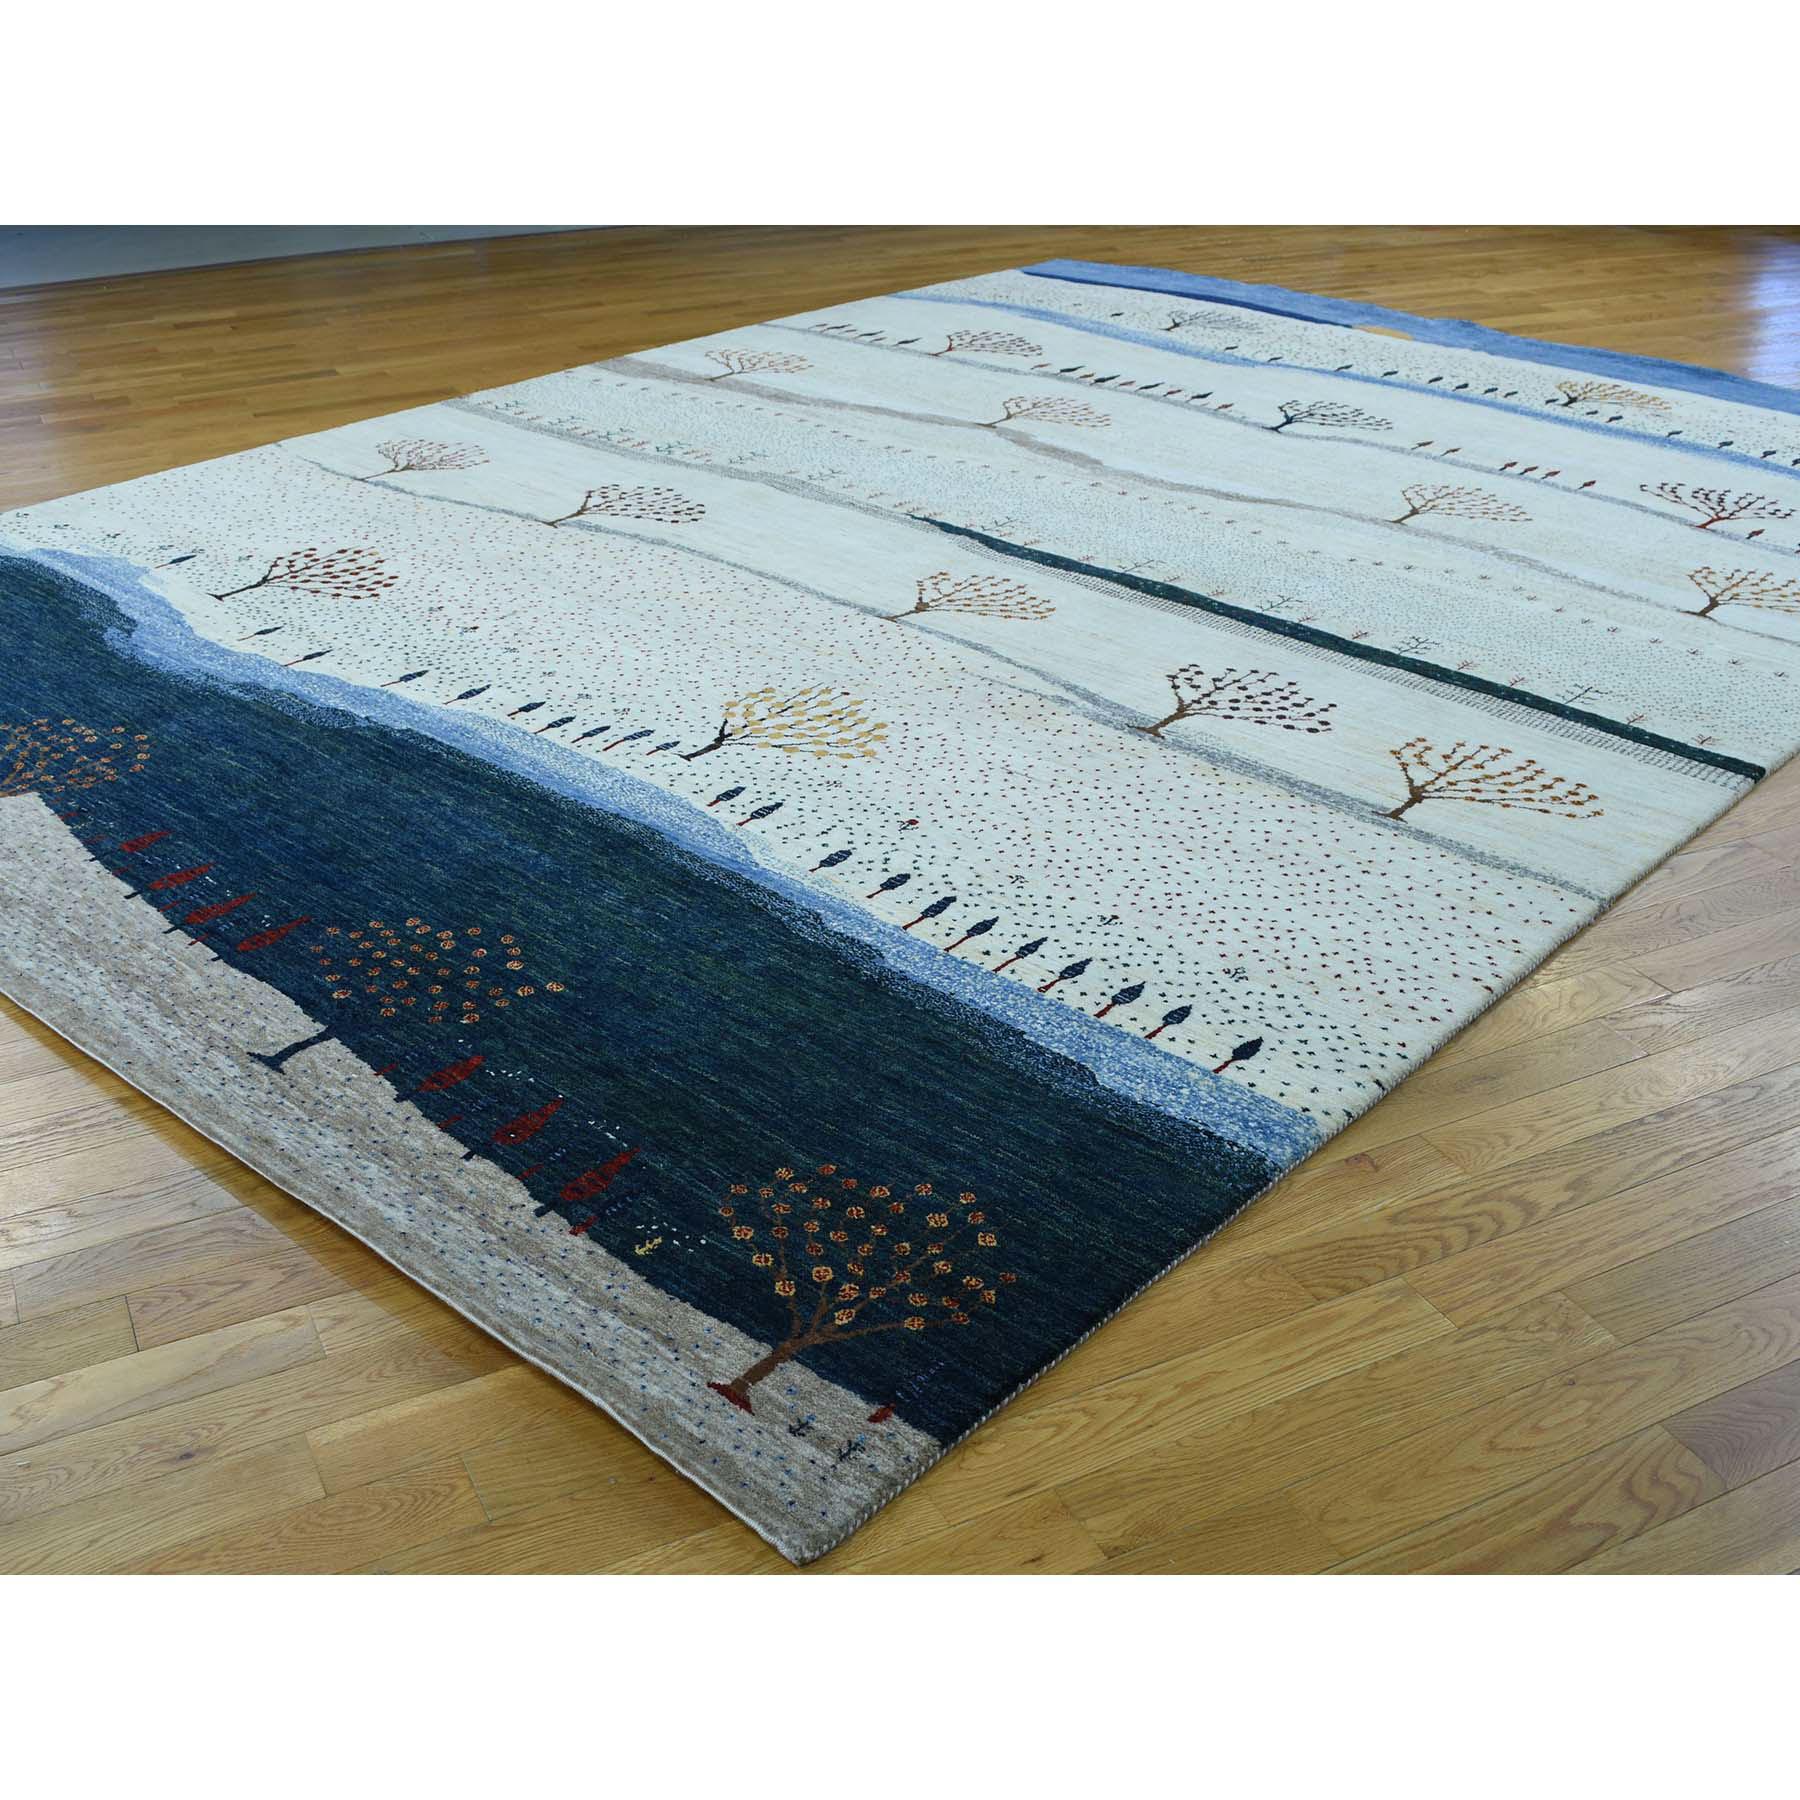 9-9 x14- Hand-Knotted Modern Folk Art Gabbeh Persian Wool Oriental Rug